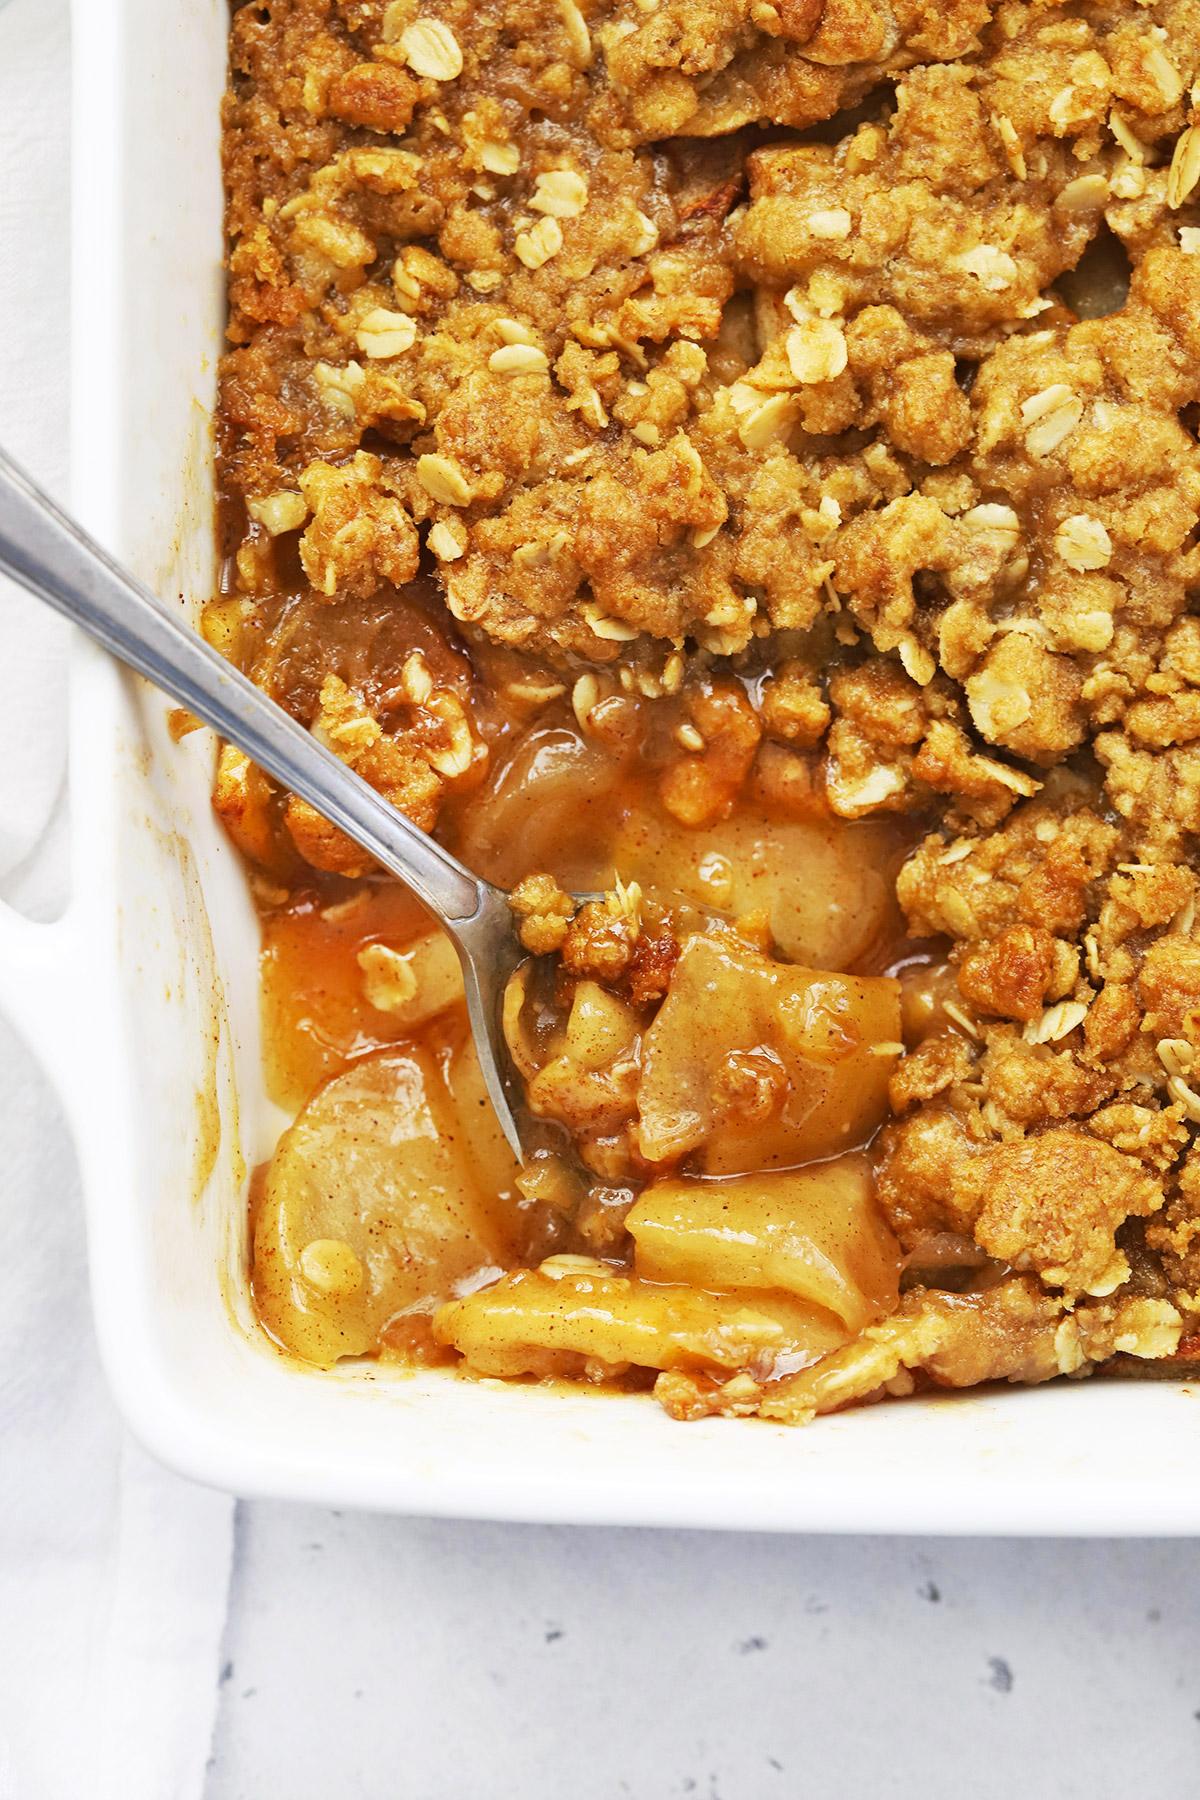 Scooping up gluten-free apple crisp.